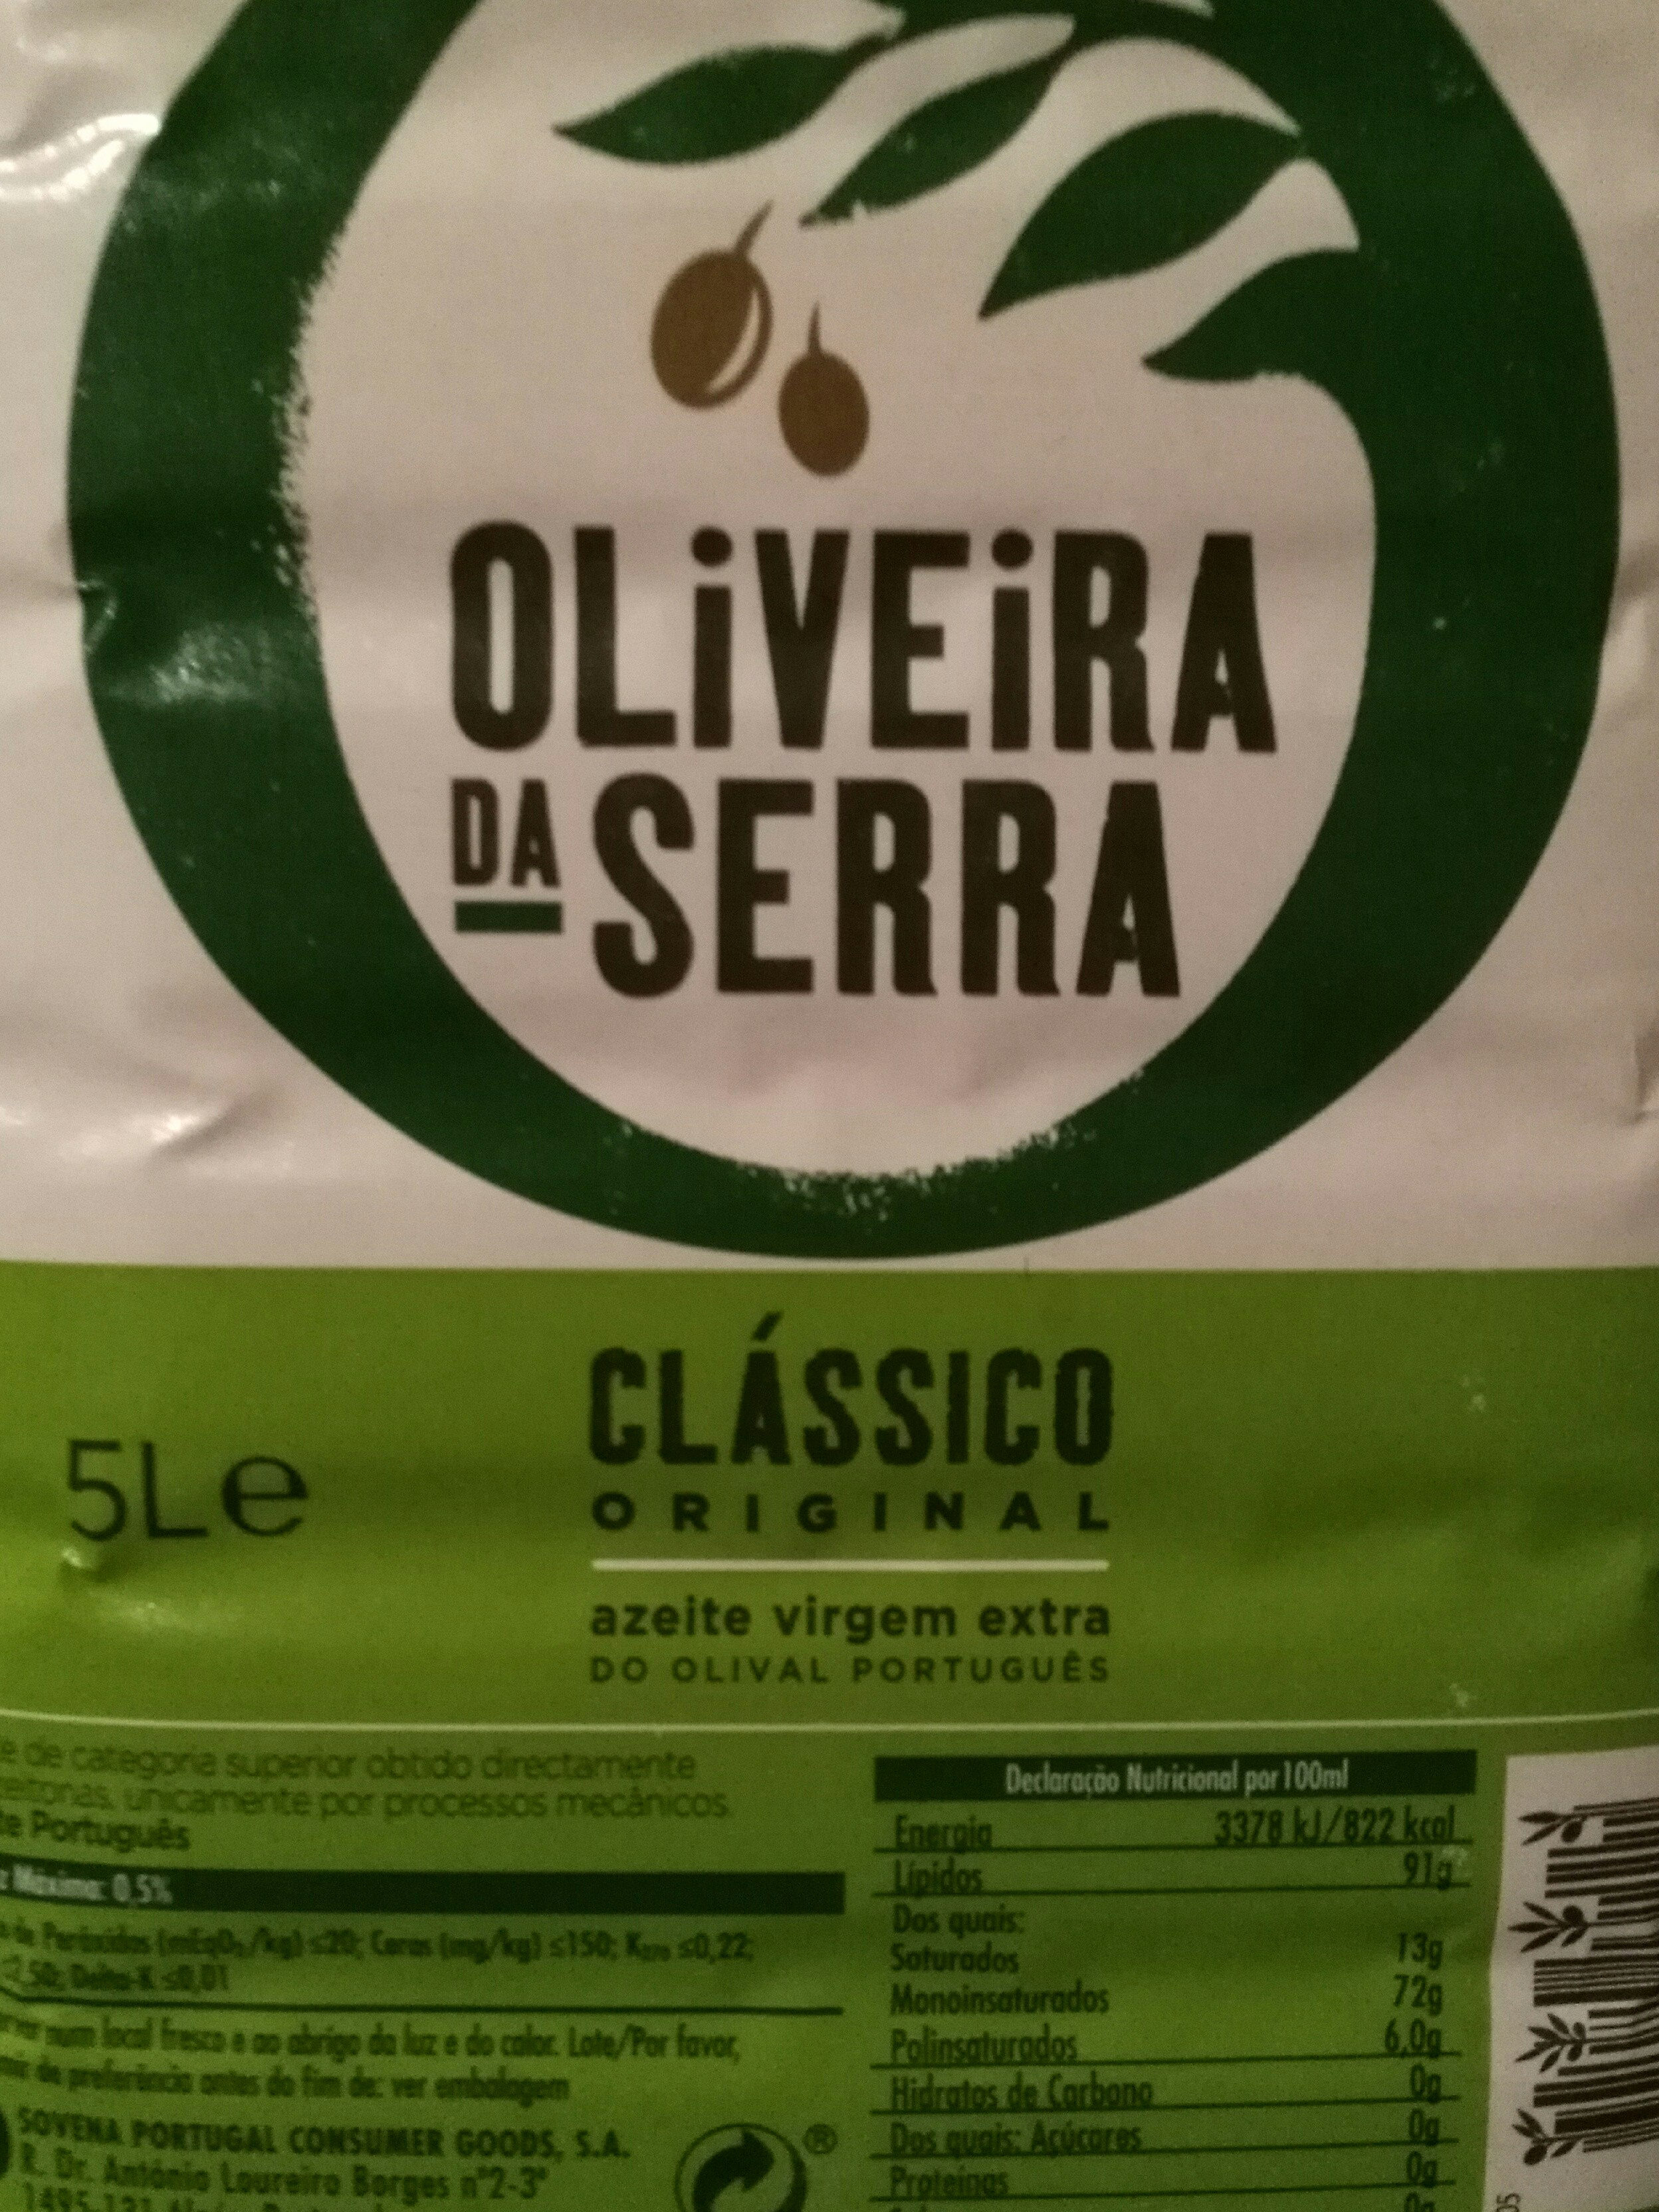 huile de Olive original extra - Produit - pt